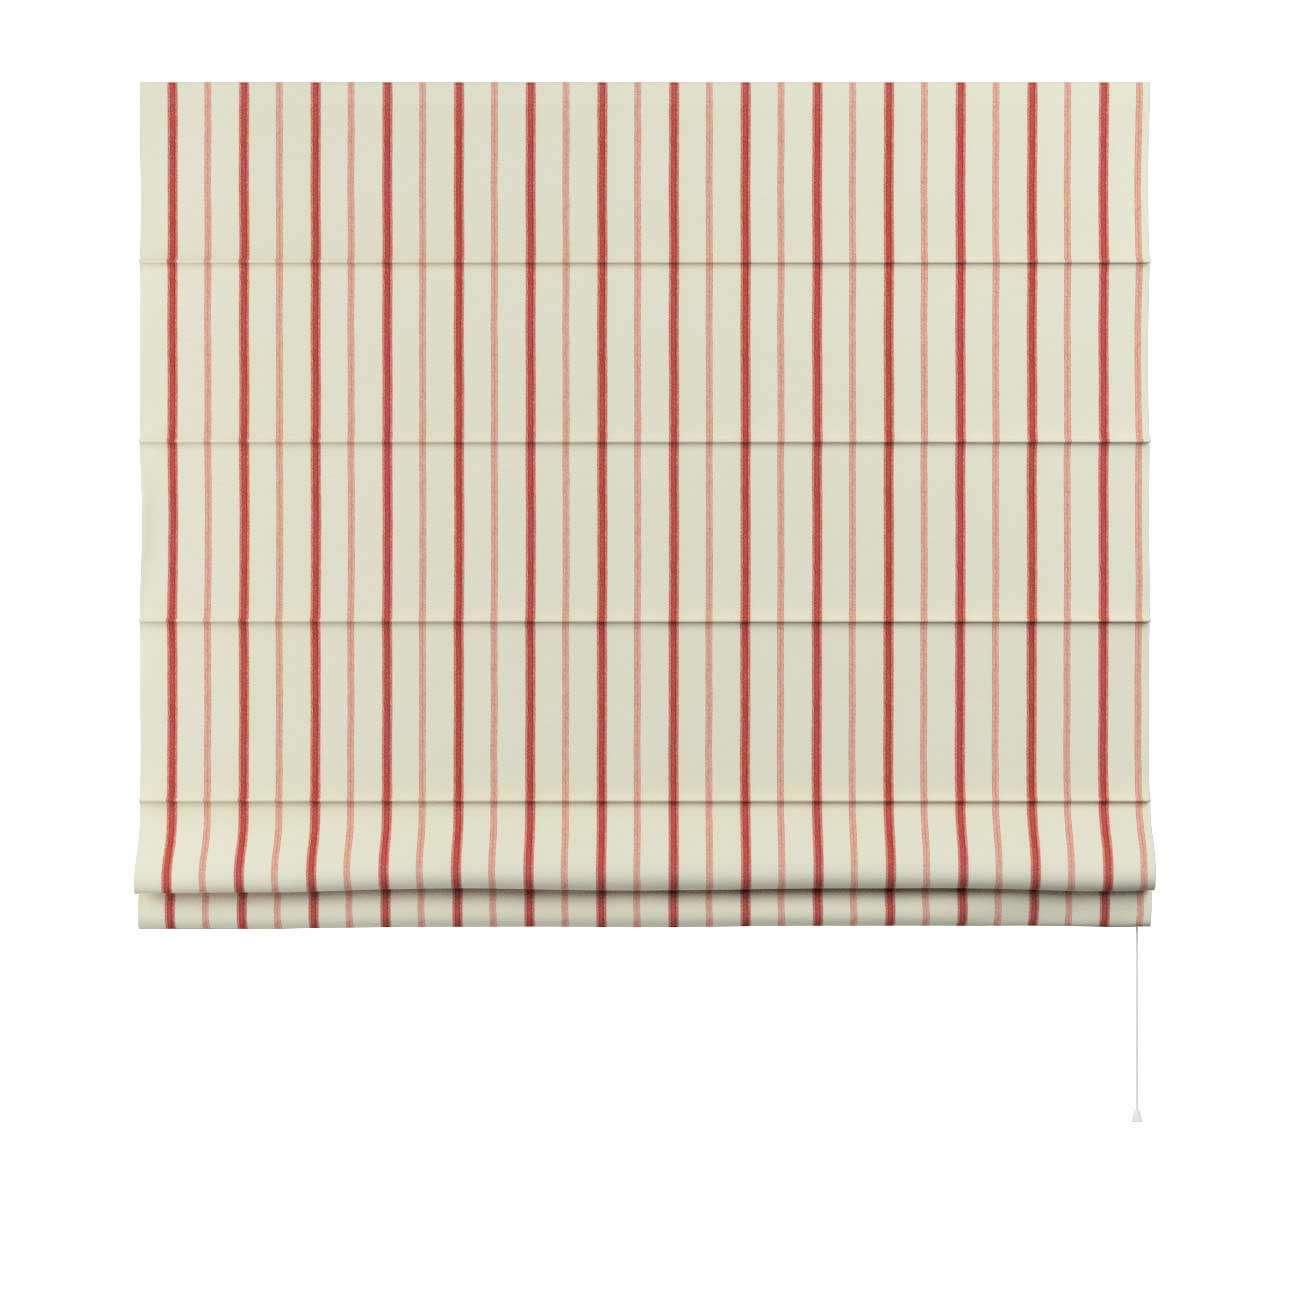 Romanetės Capri 80 x 170 cm (plotis x ilgis) kolekcijoje Avinon, audinys: 129-15